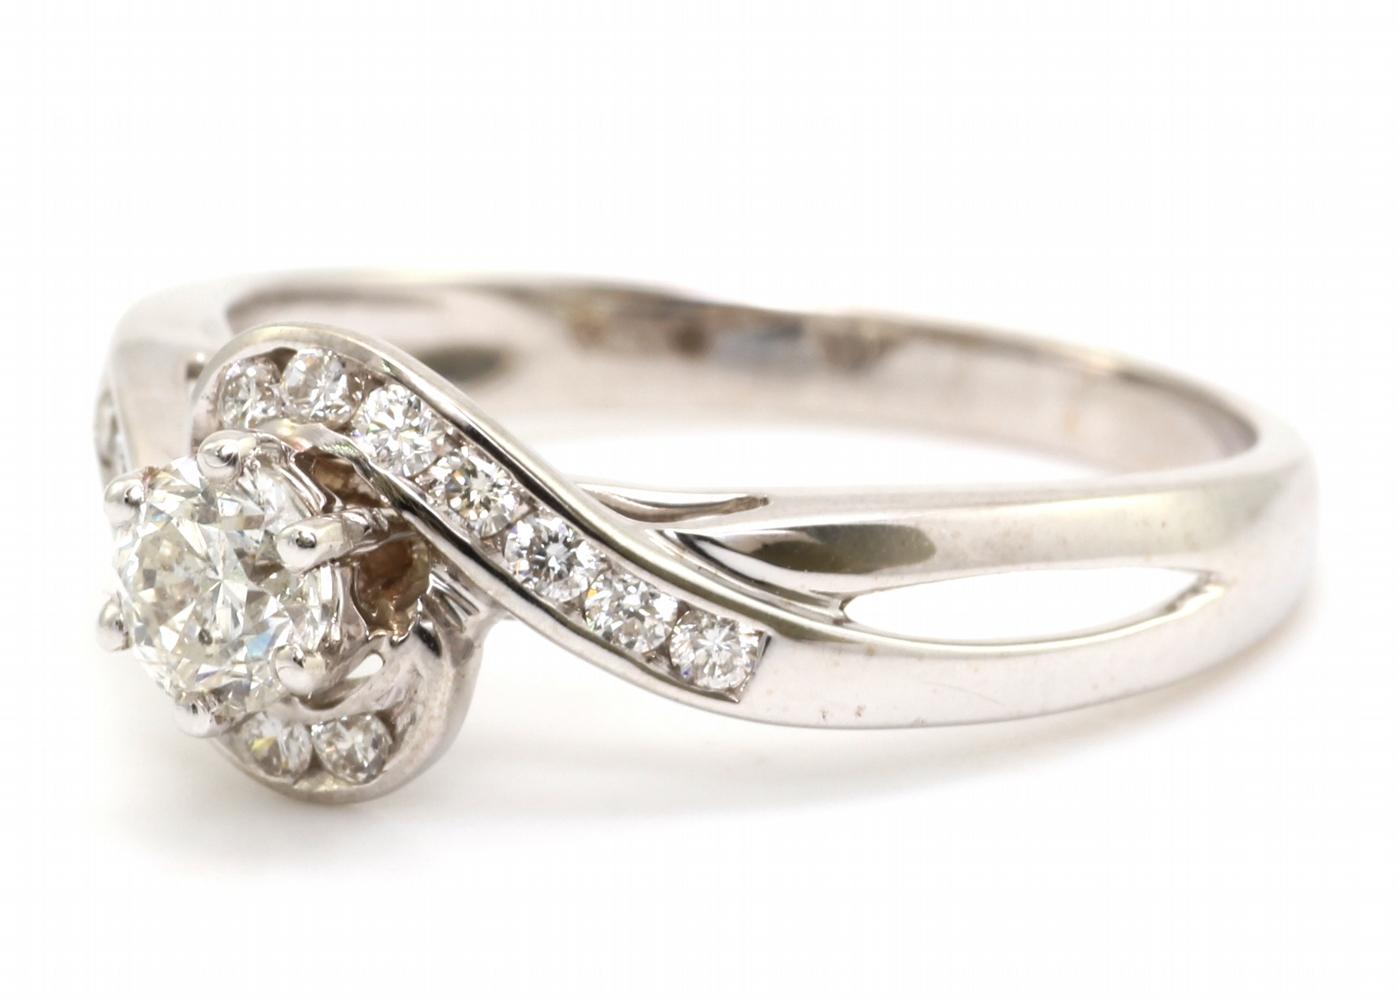 18ct White Gold Twist Diamond Ring 0.54 Carats - Image 2 of 4